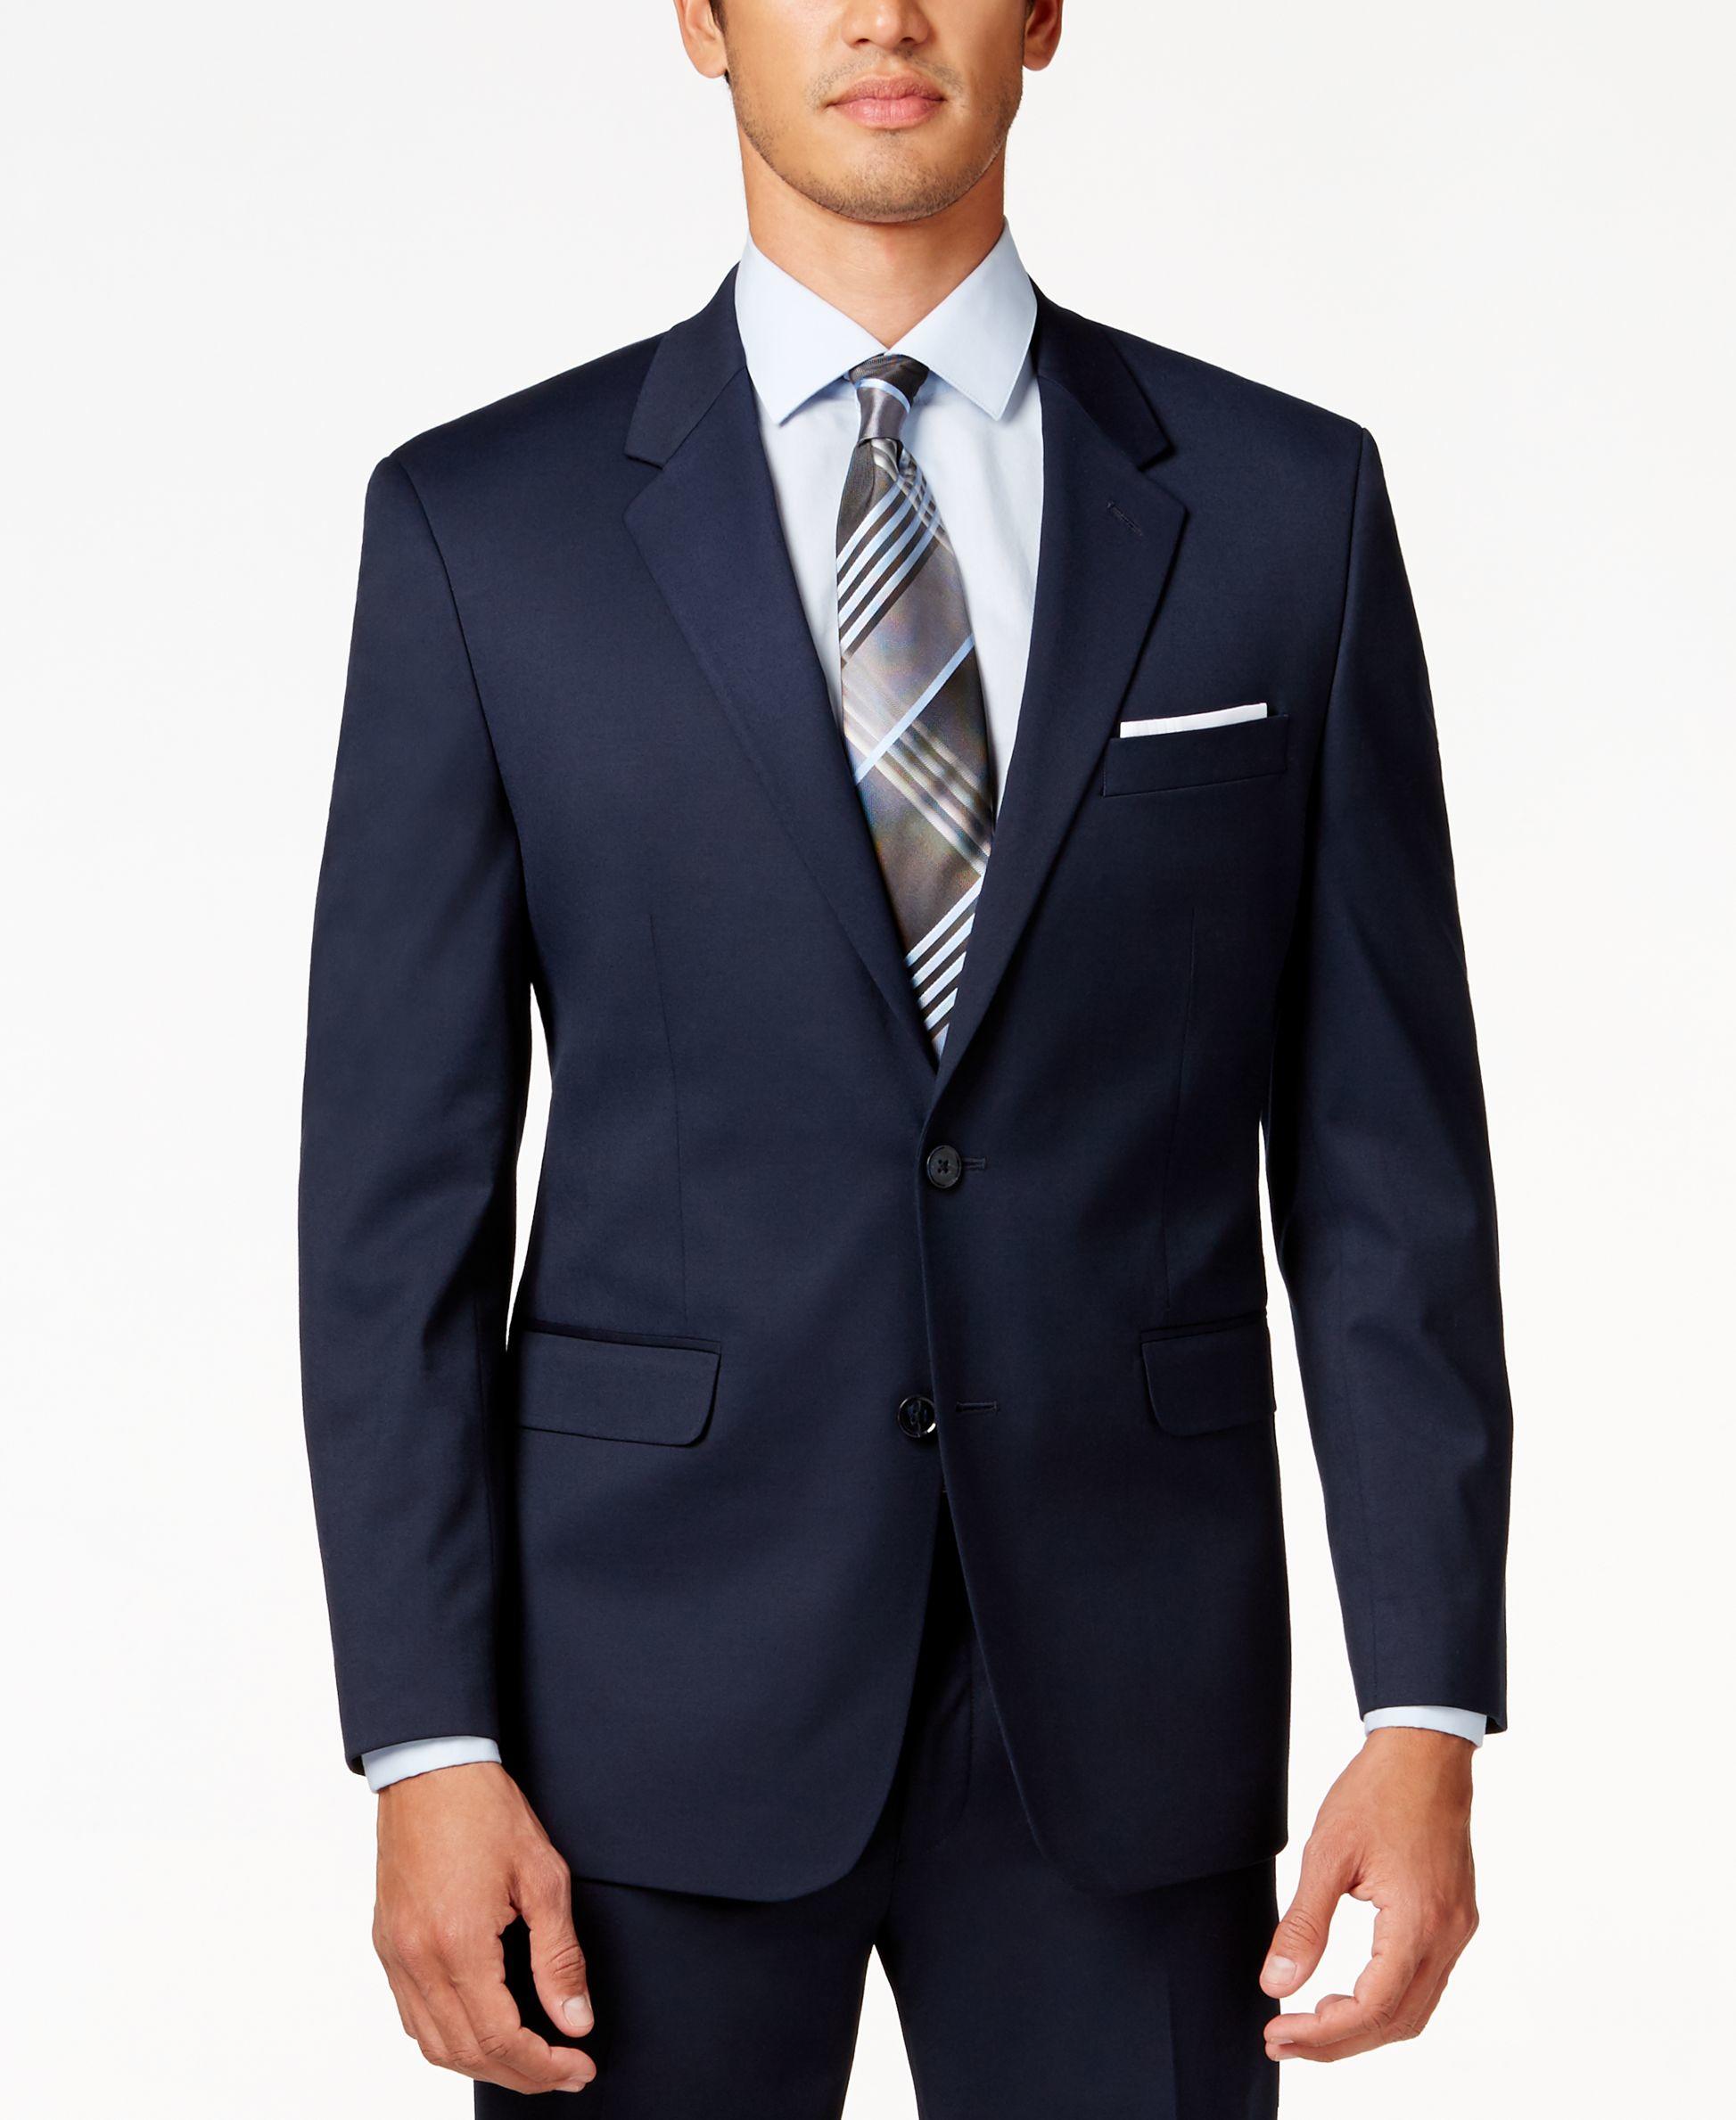 Macys mens clothing online